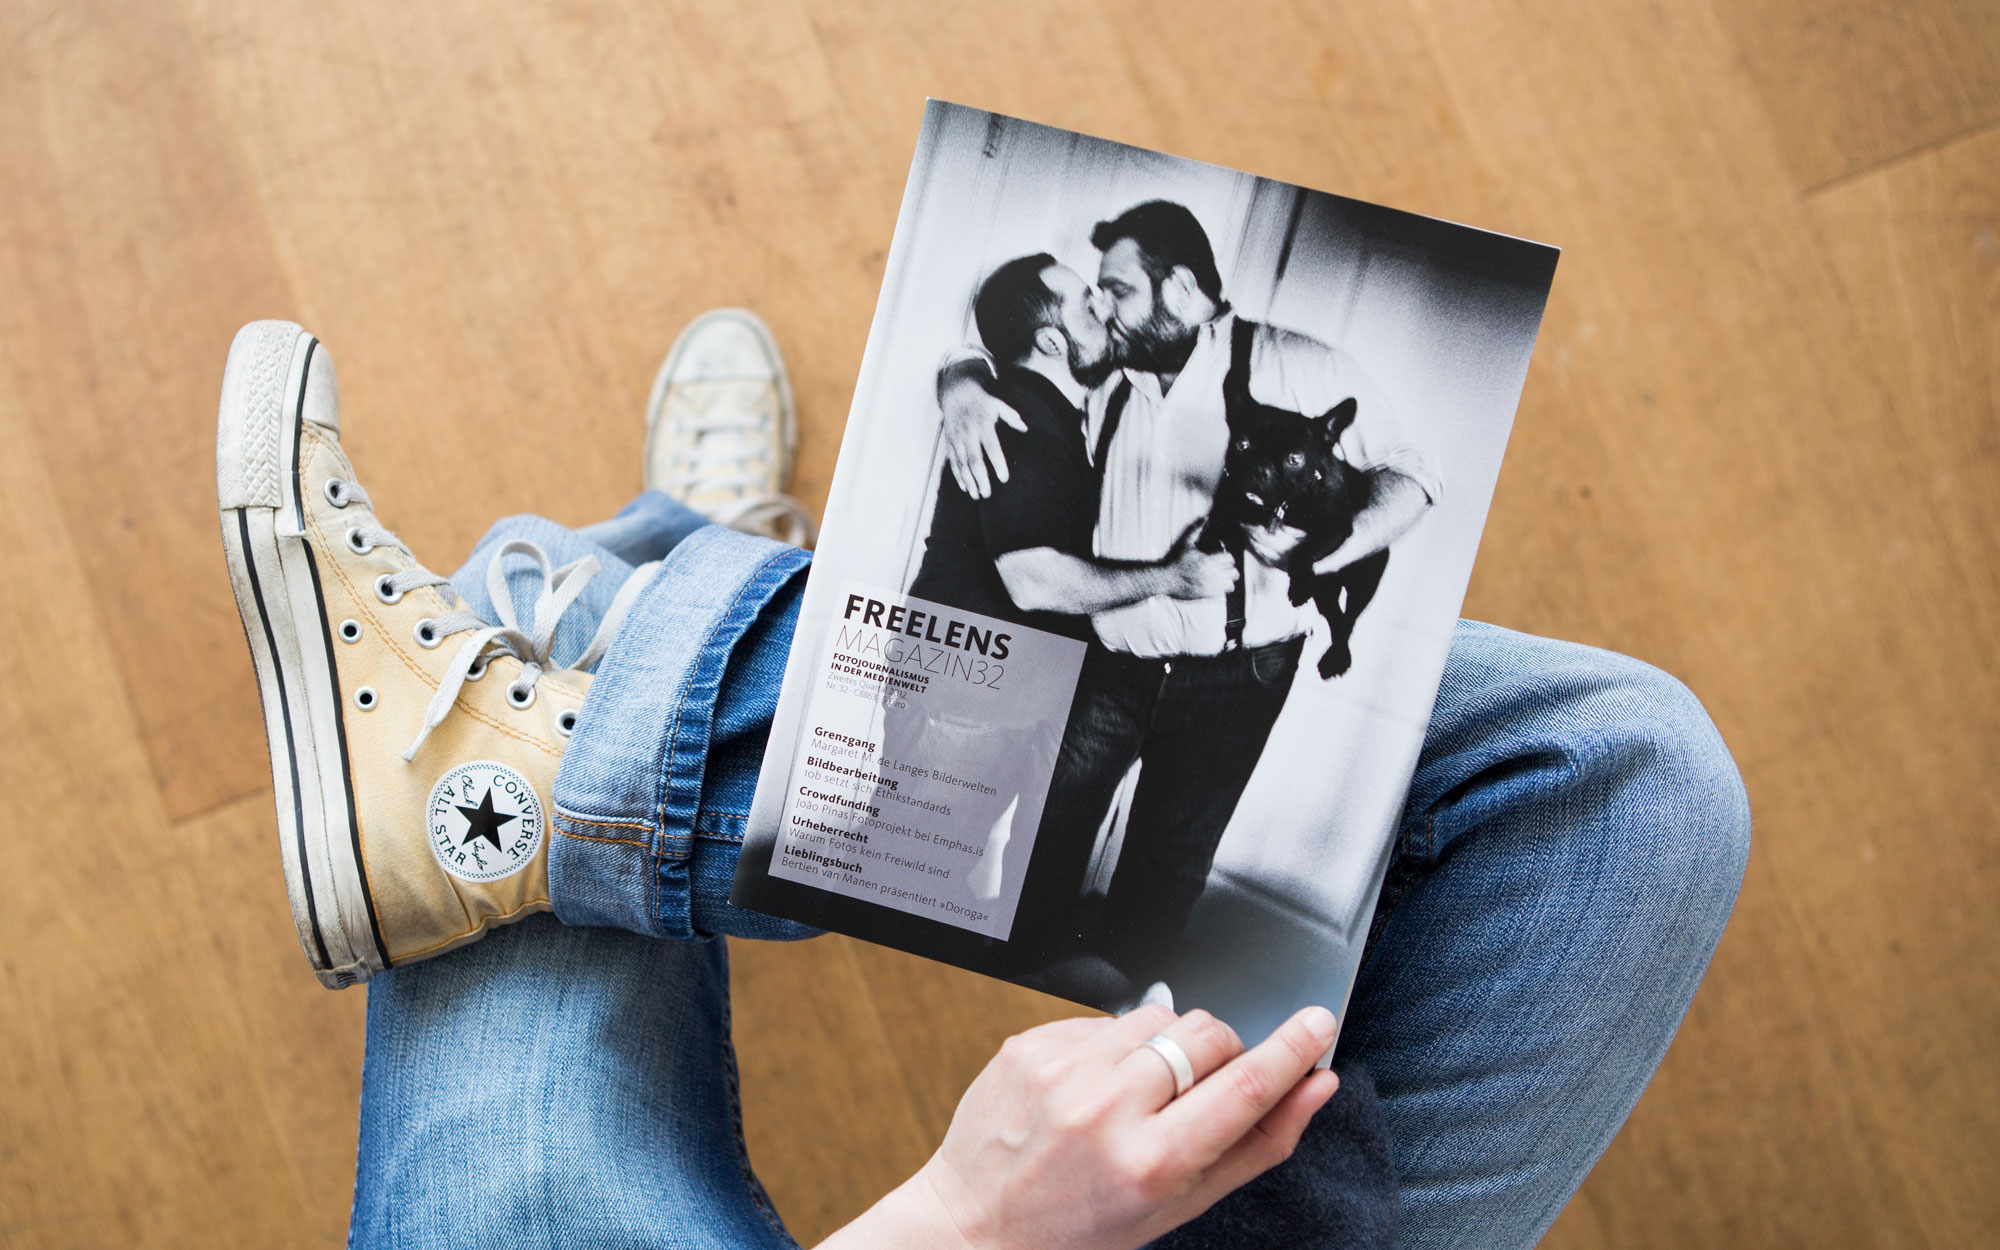 FREELENS Magazin #32. Foto: Lucas Wahl